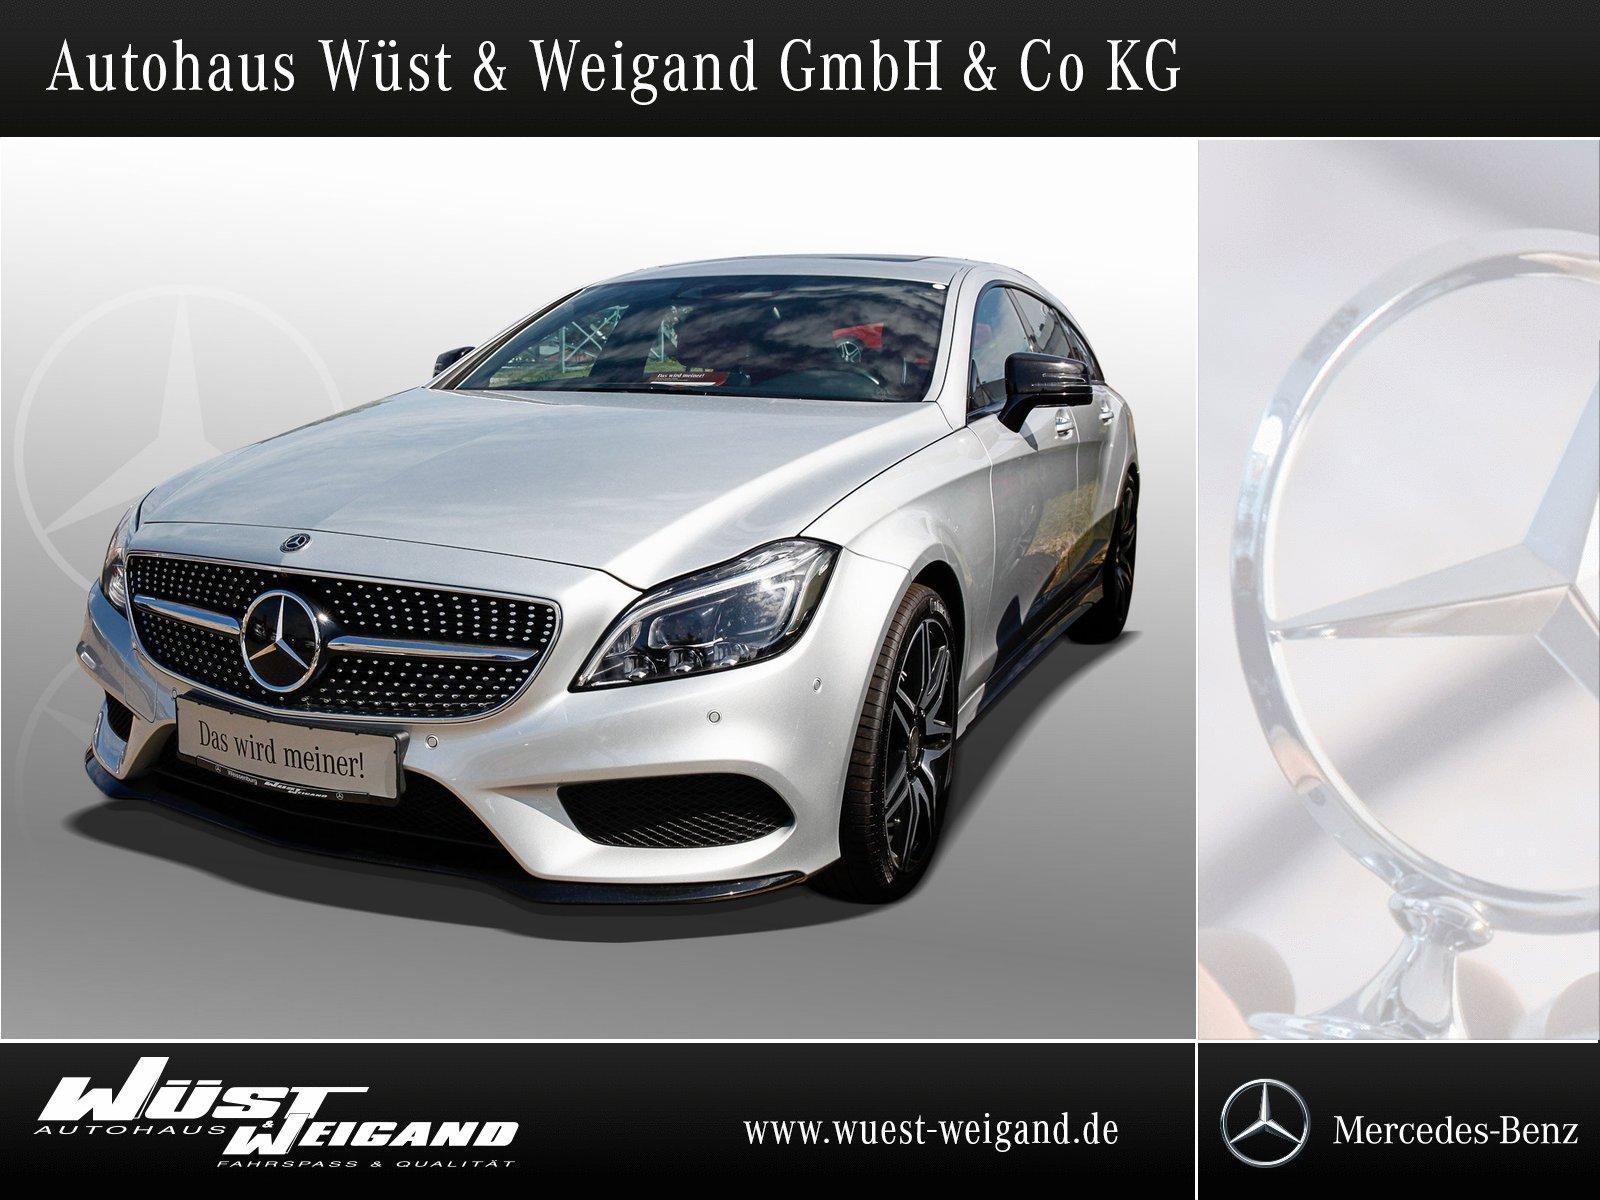 Mercedes-Benz CLS 500 4M SB AMG Styling+Distronic+Comand+LED, Jahr 2016, petrol